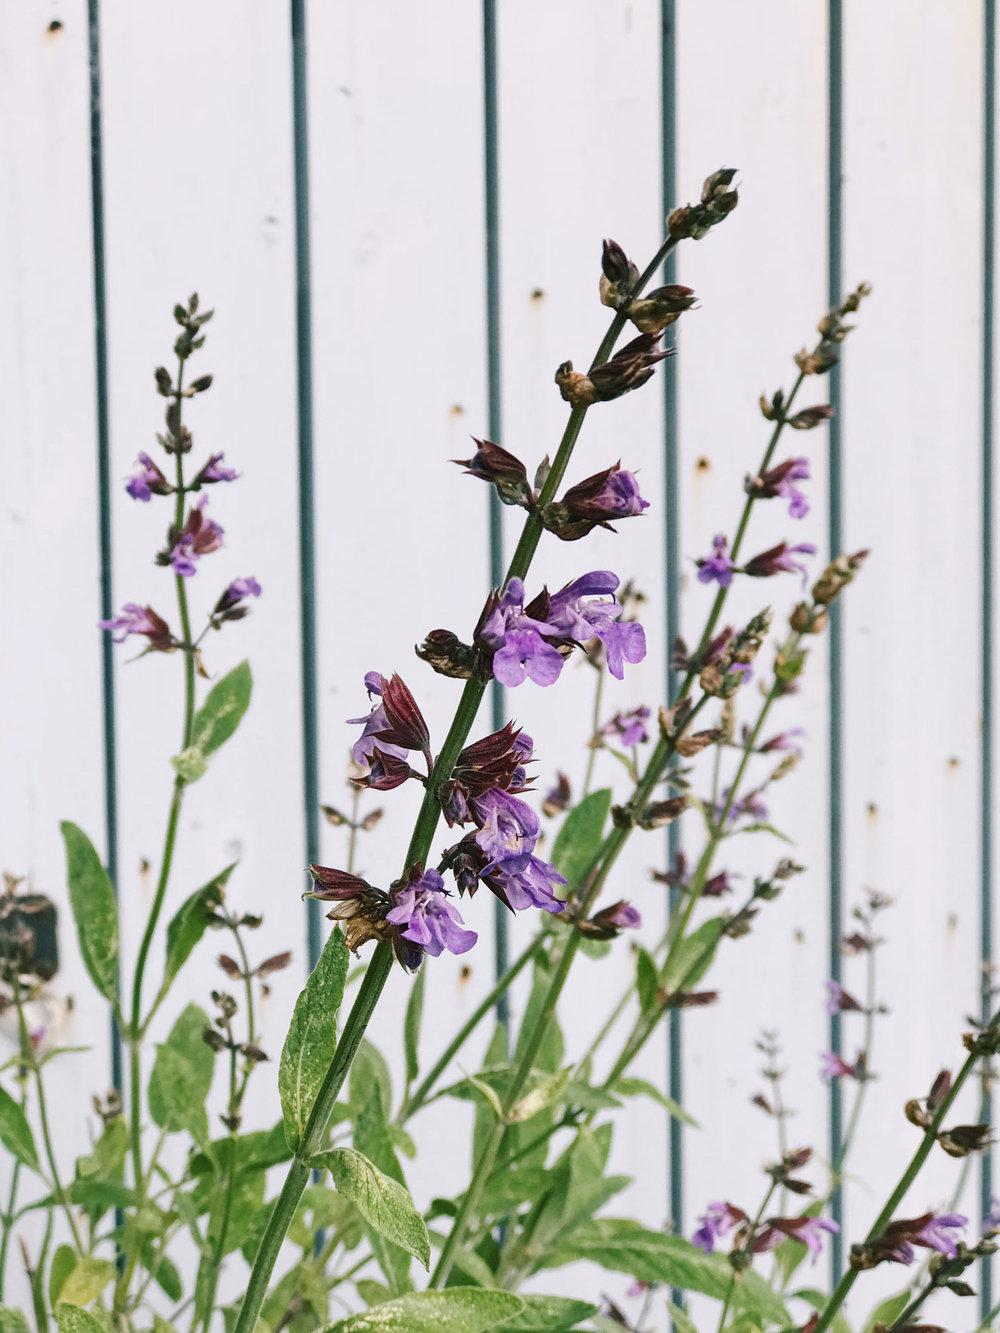 Wild flowers in a secret garden